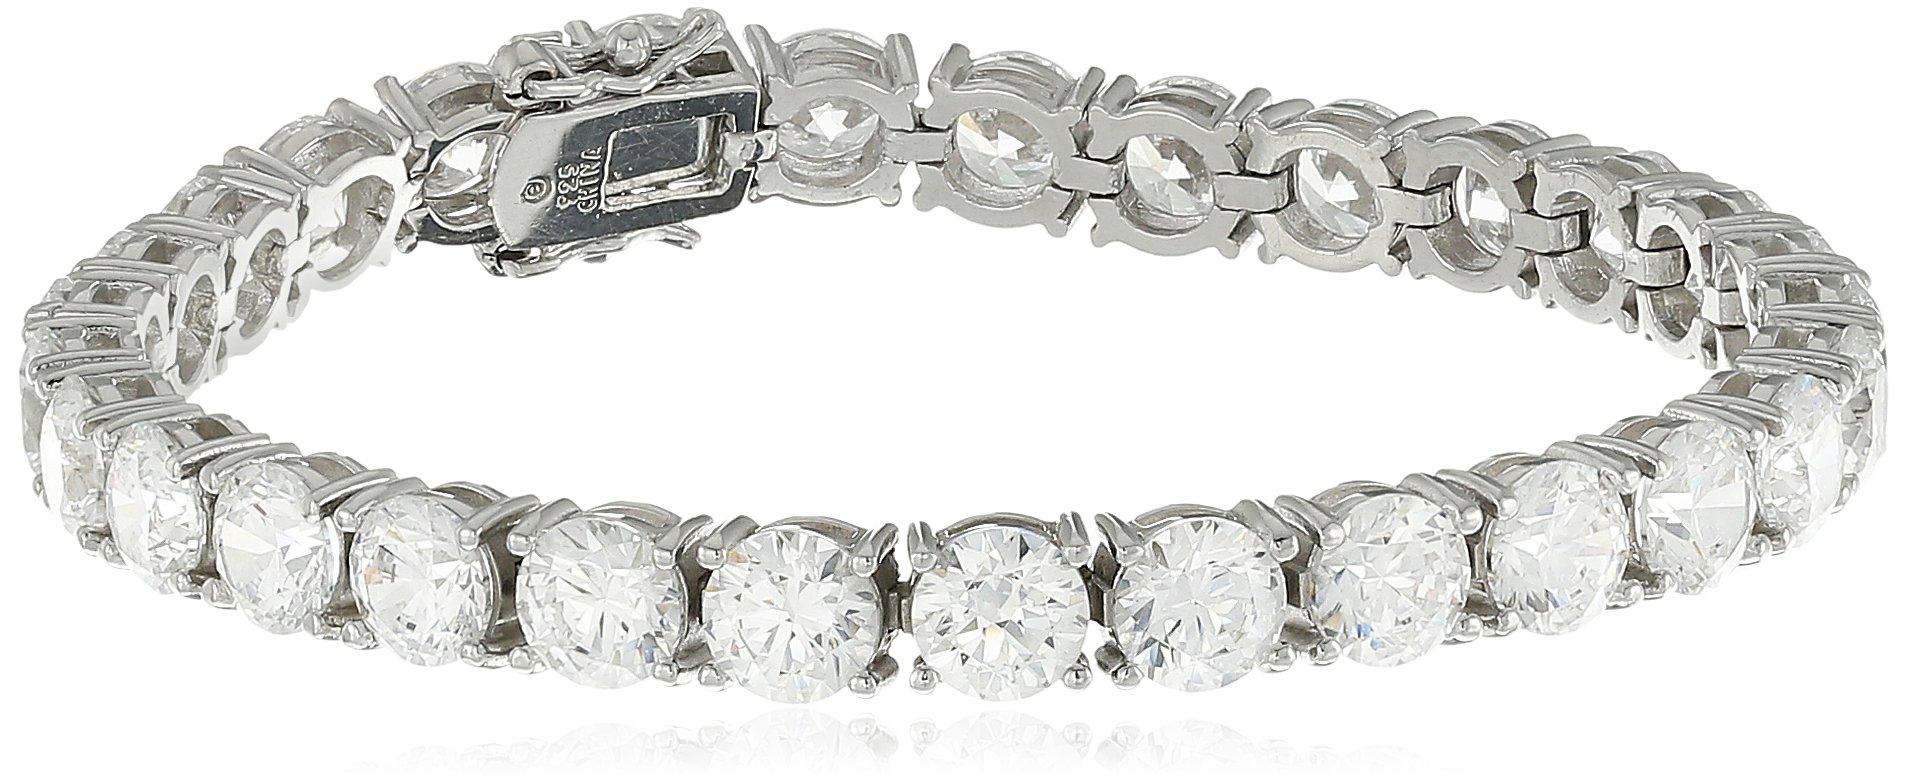 Platinum-plated Sterling Silver Swarovski Zirconia Round-Cut Tennis Bracelet, 7.25''